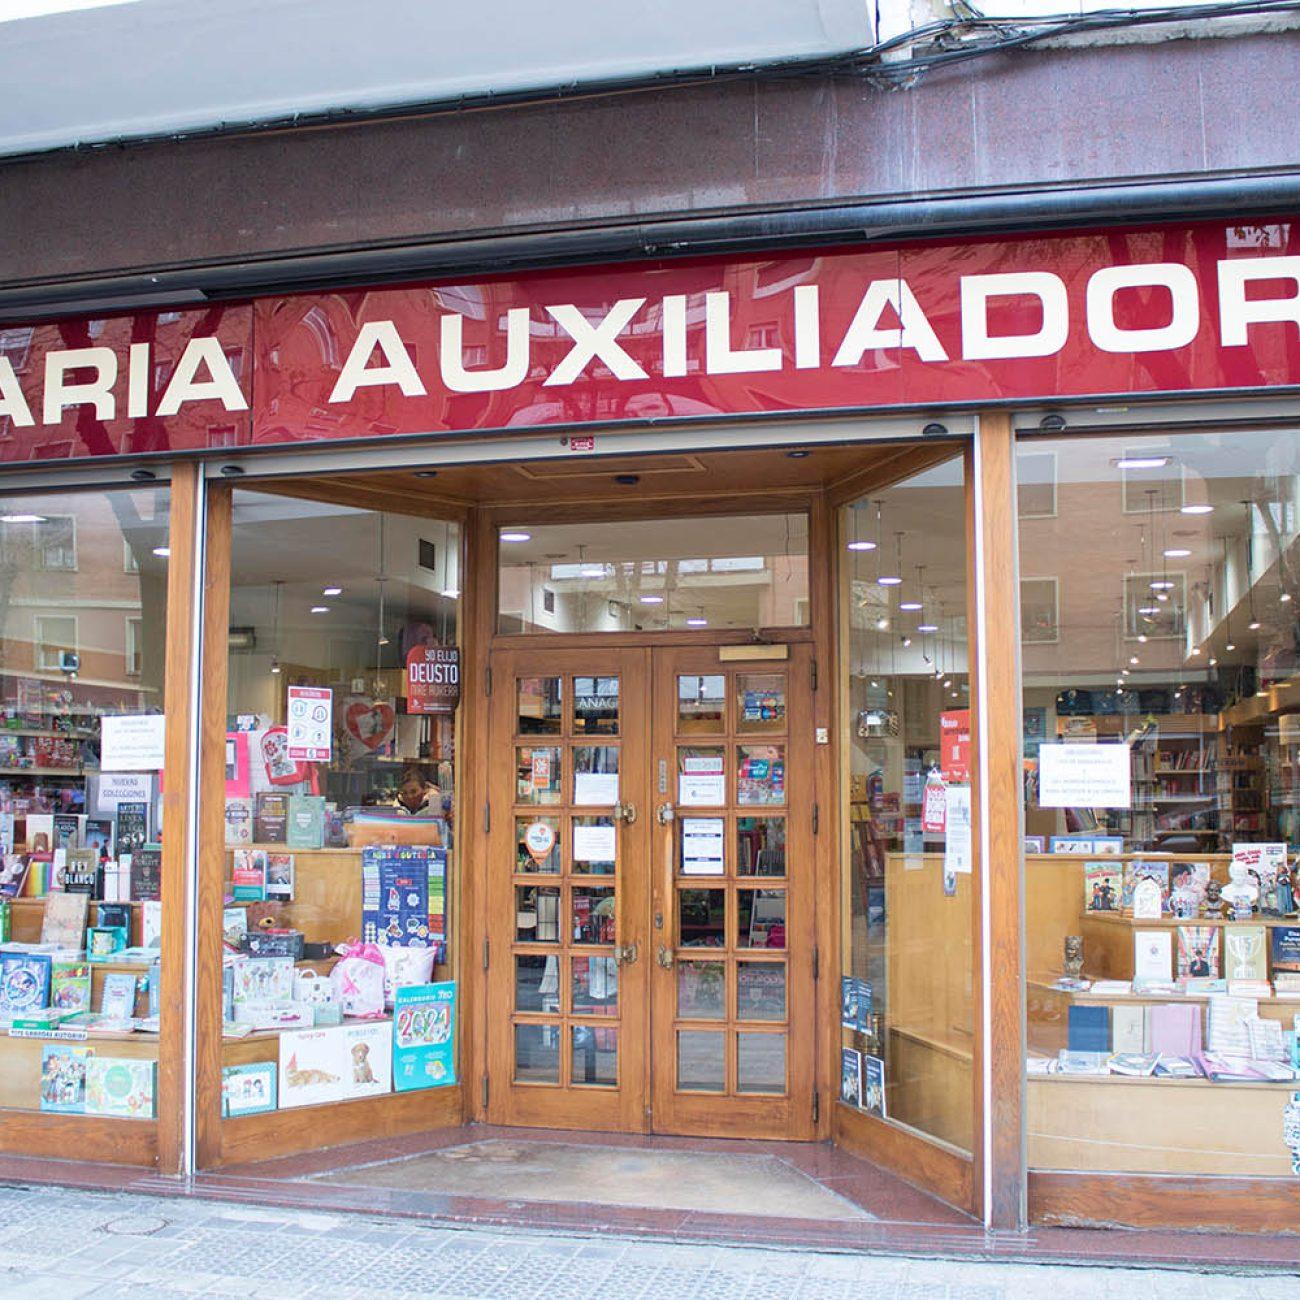 Librería María Auxiliadora en Deusto